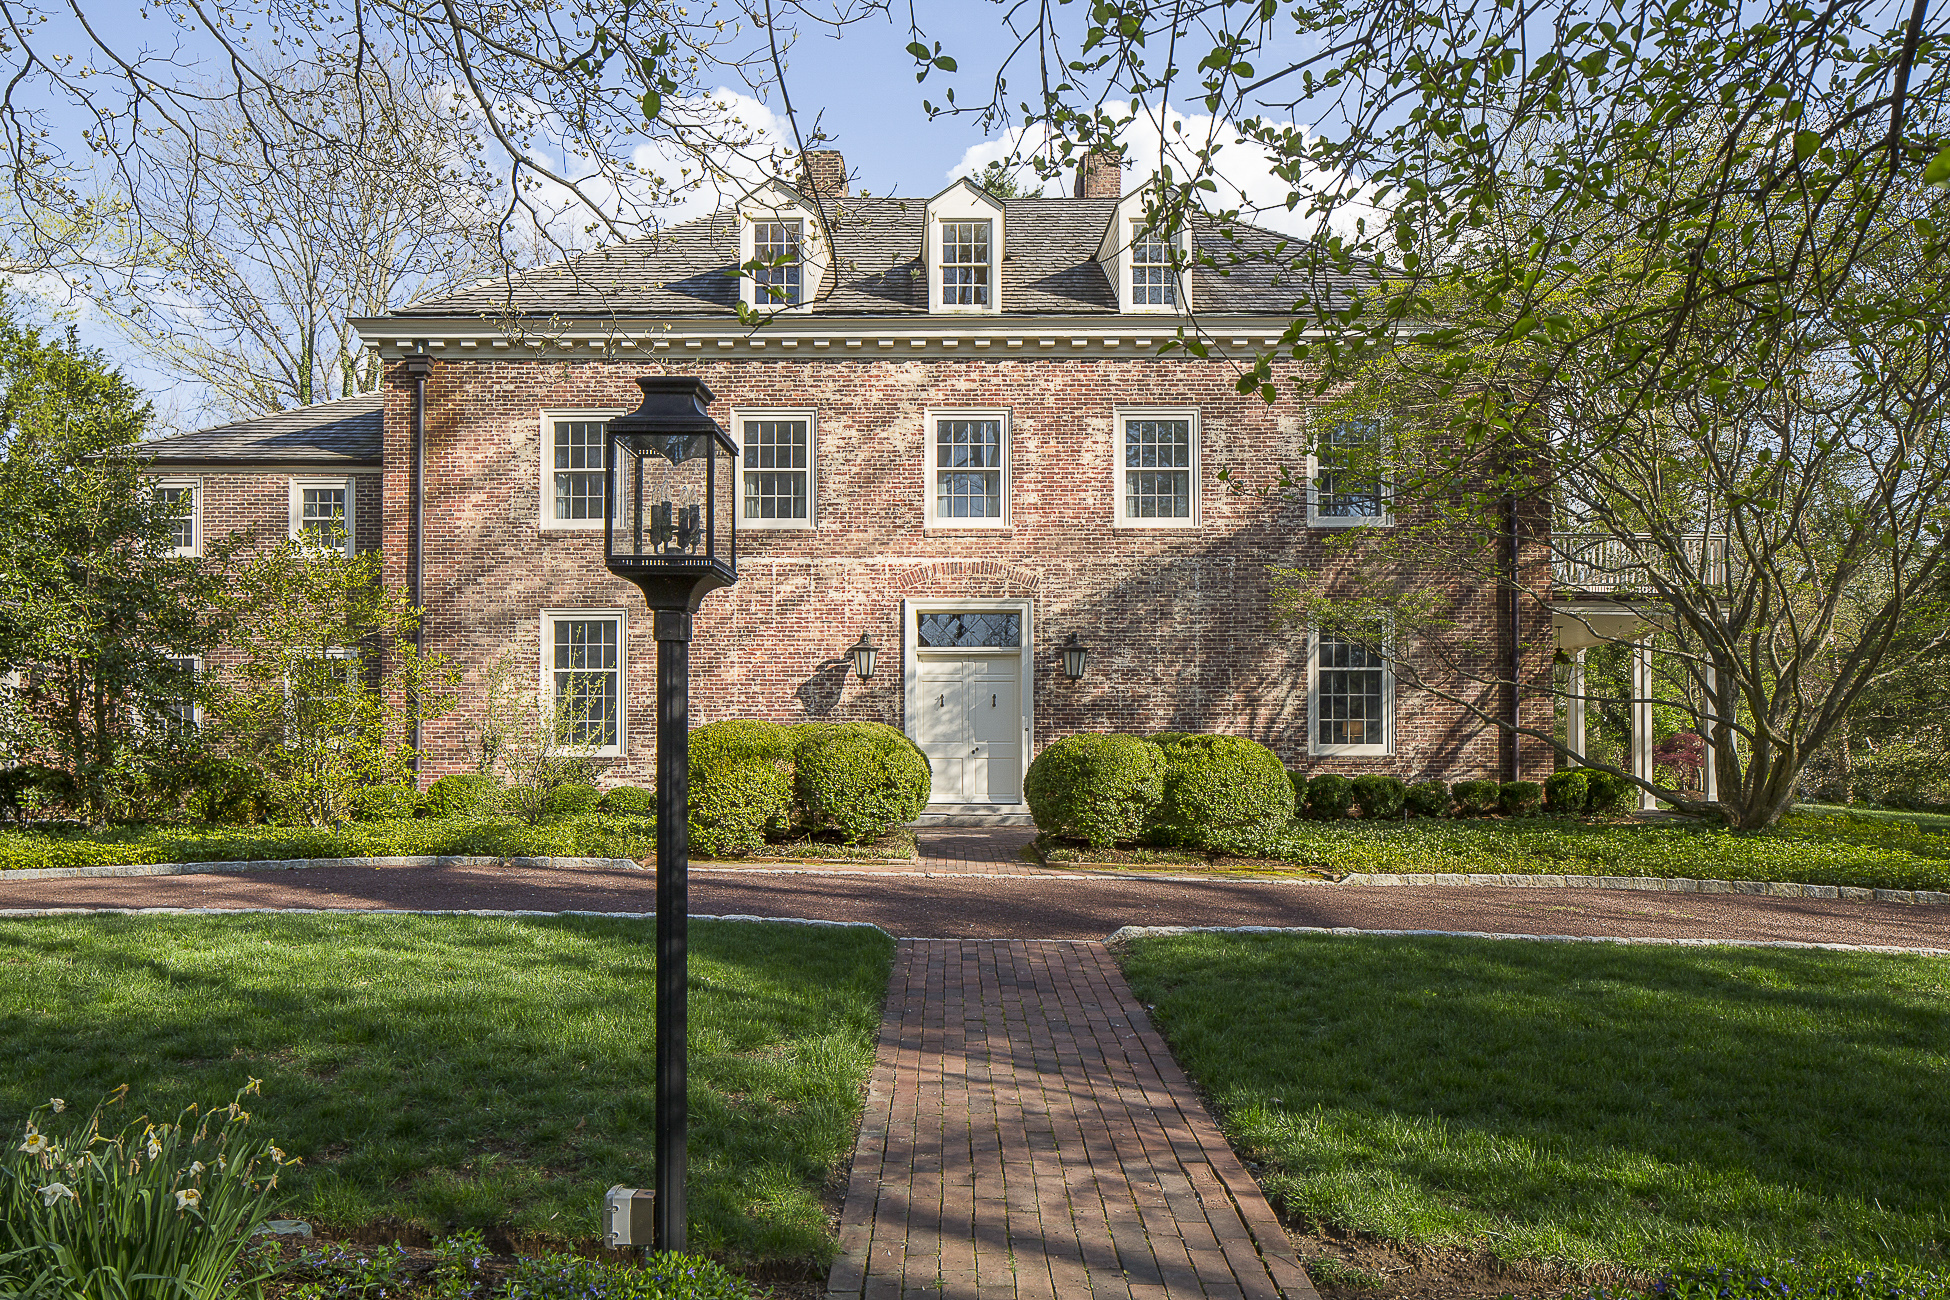 独户住宅 为 销售 在 Truly Uncompromising 102 Lafayette Road Princeton, 新泽西州 08540 美国